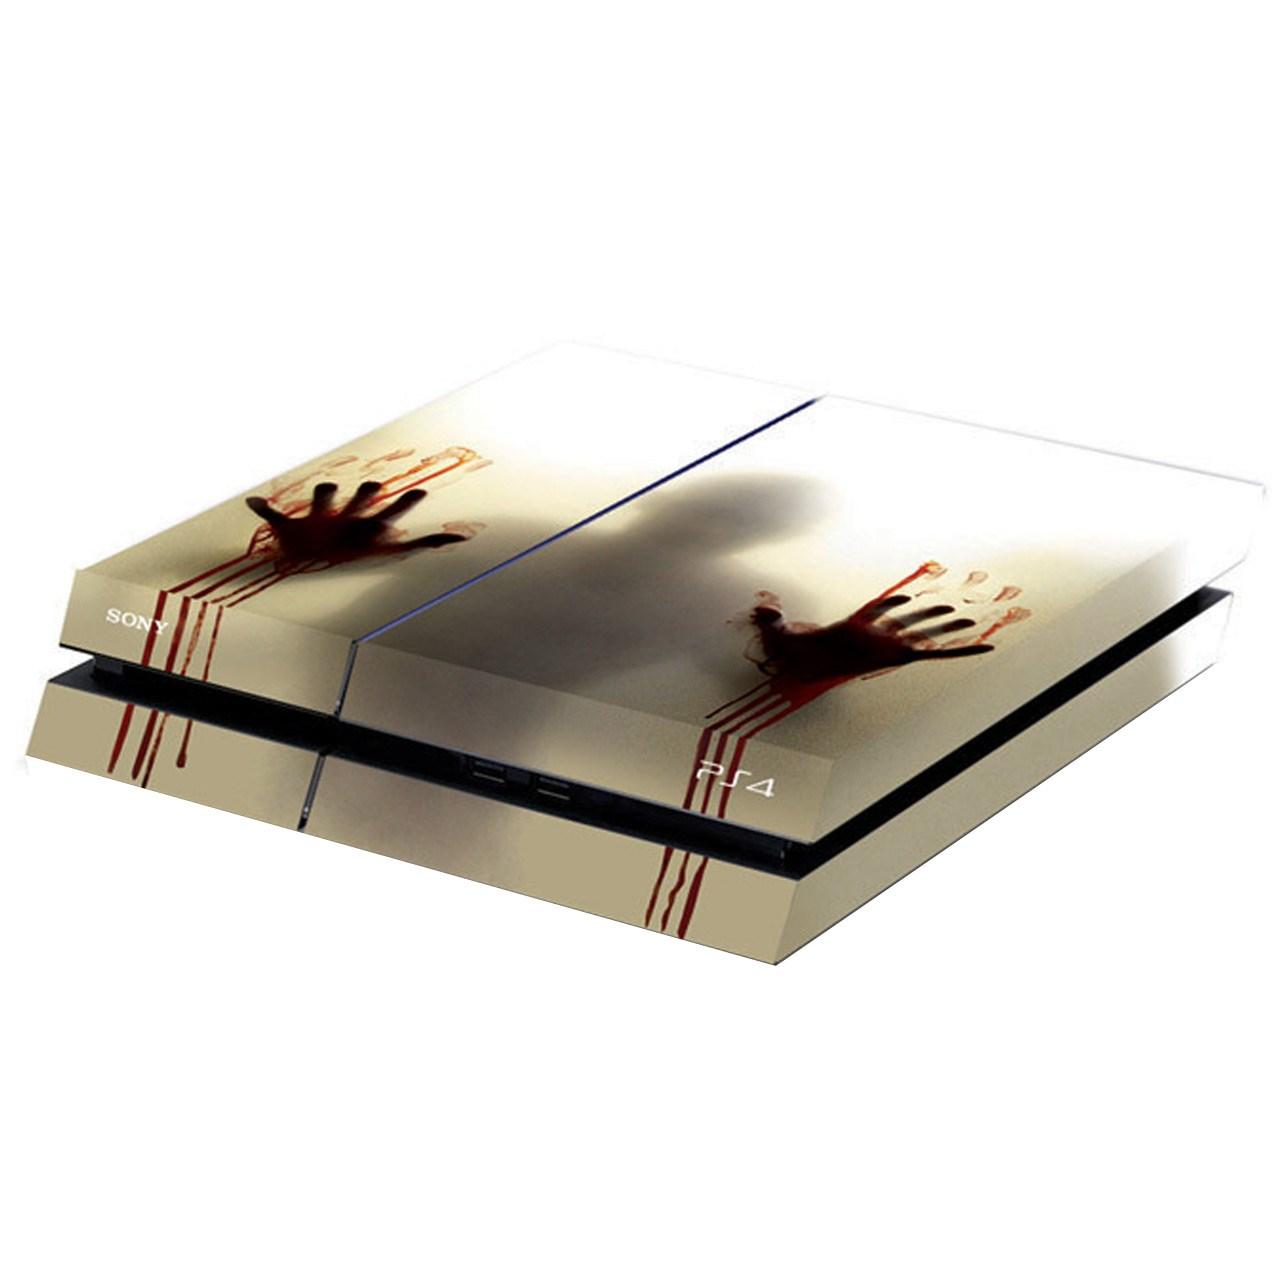 عکس برچسب افقی پلی استیشن 4 گراسیپا طرح Walking Dead